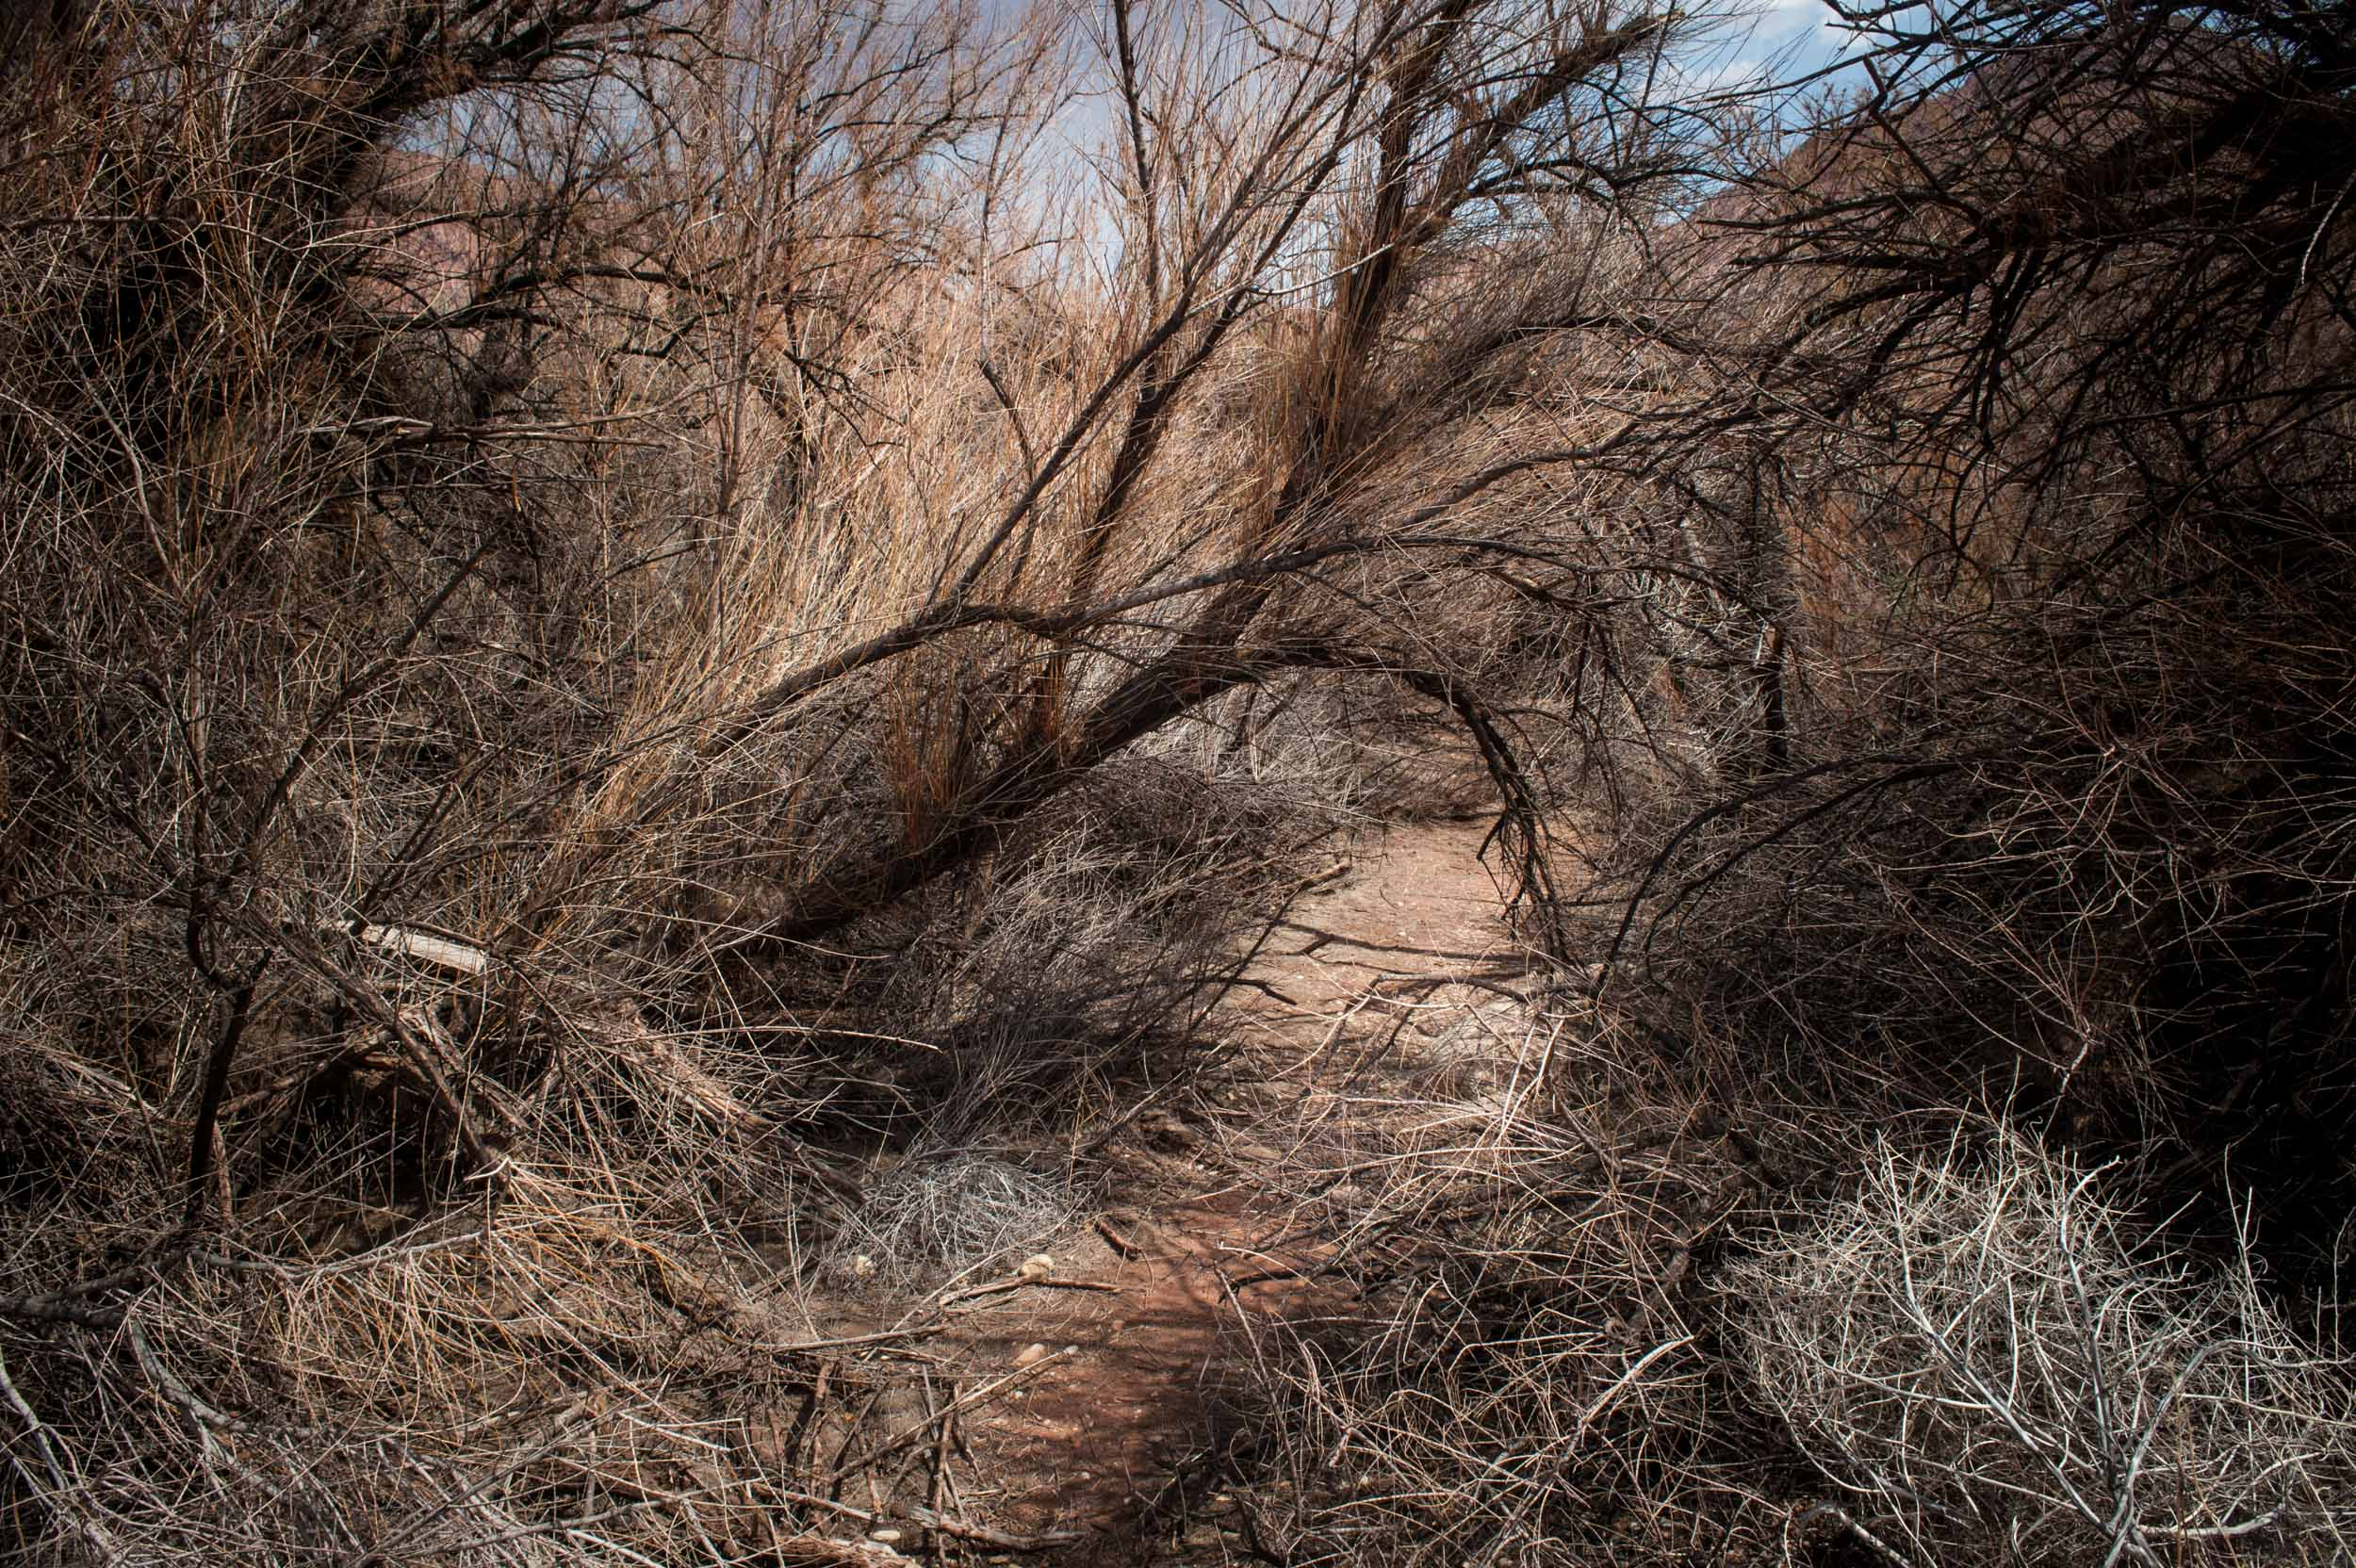 Heavy brush near the fork of the Paria and Colorado rivers. Northern Colorado Plateau, Arizona.